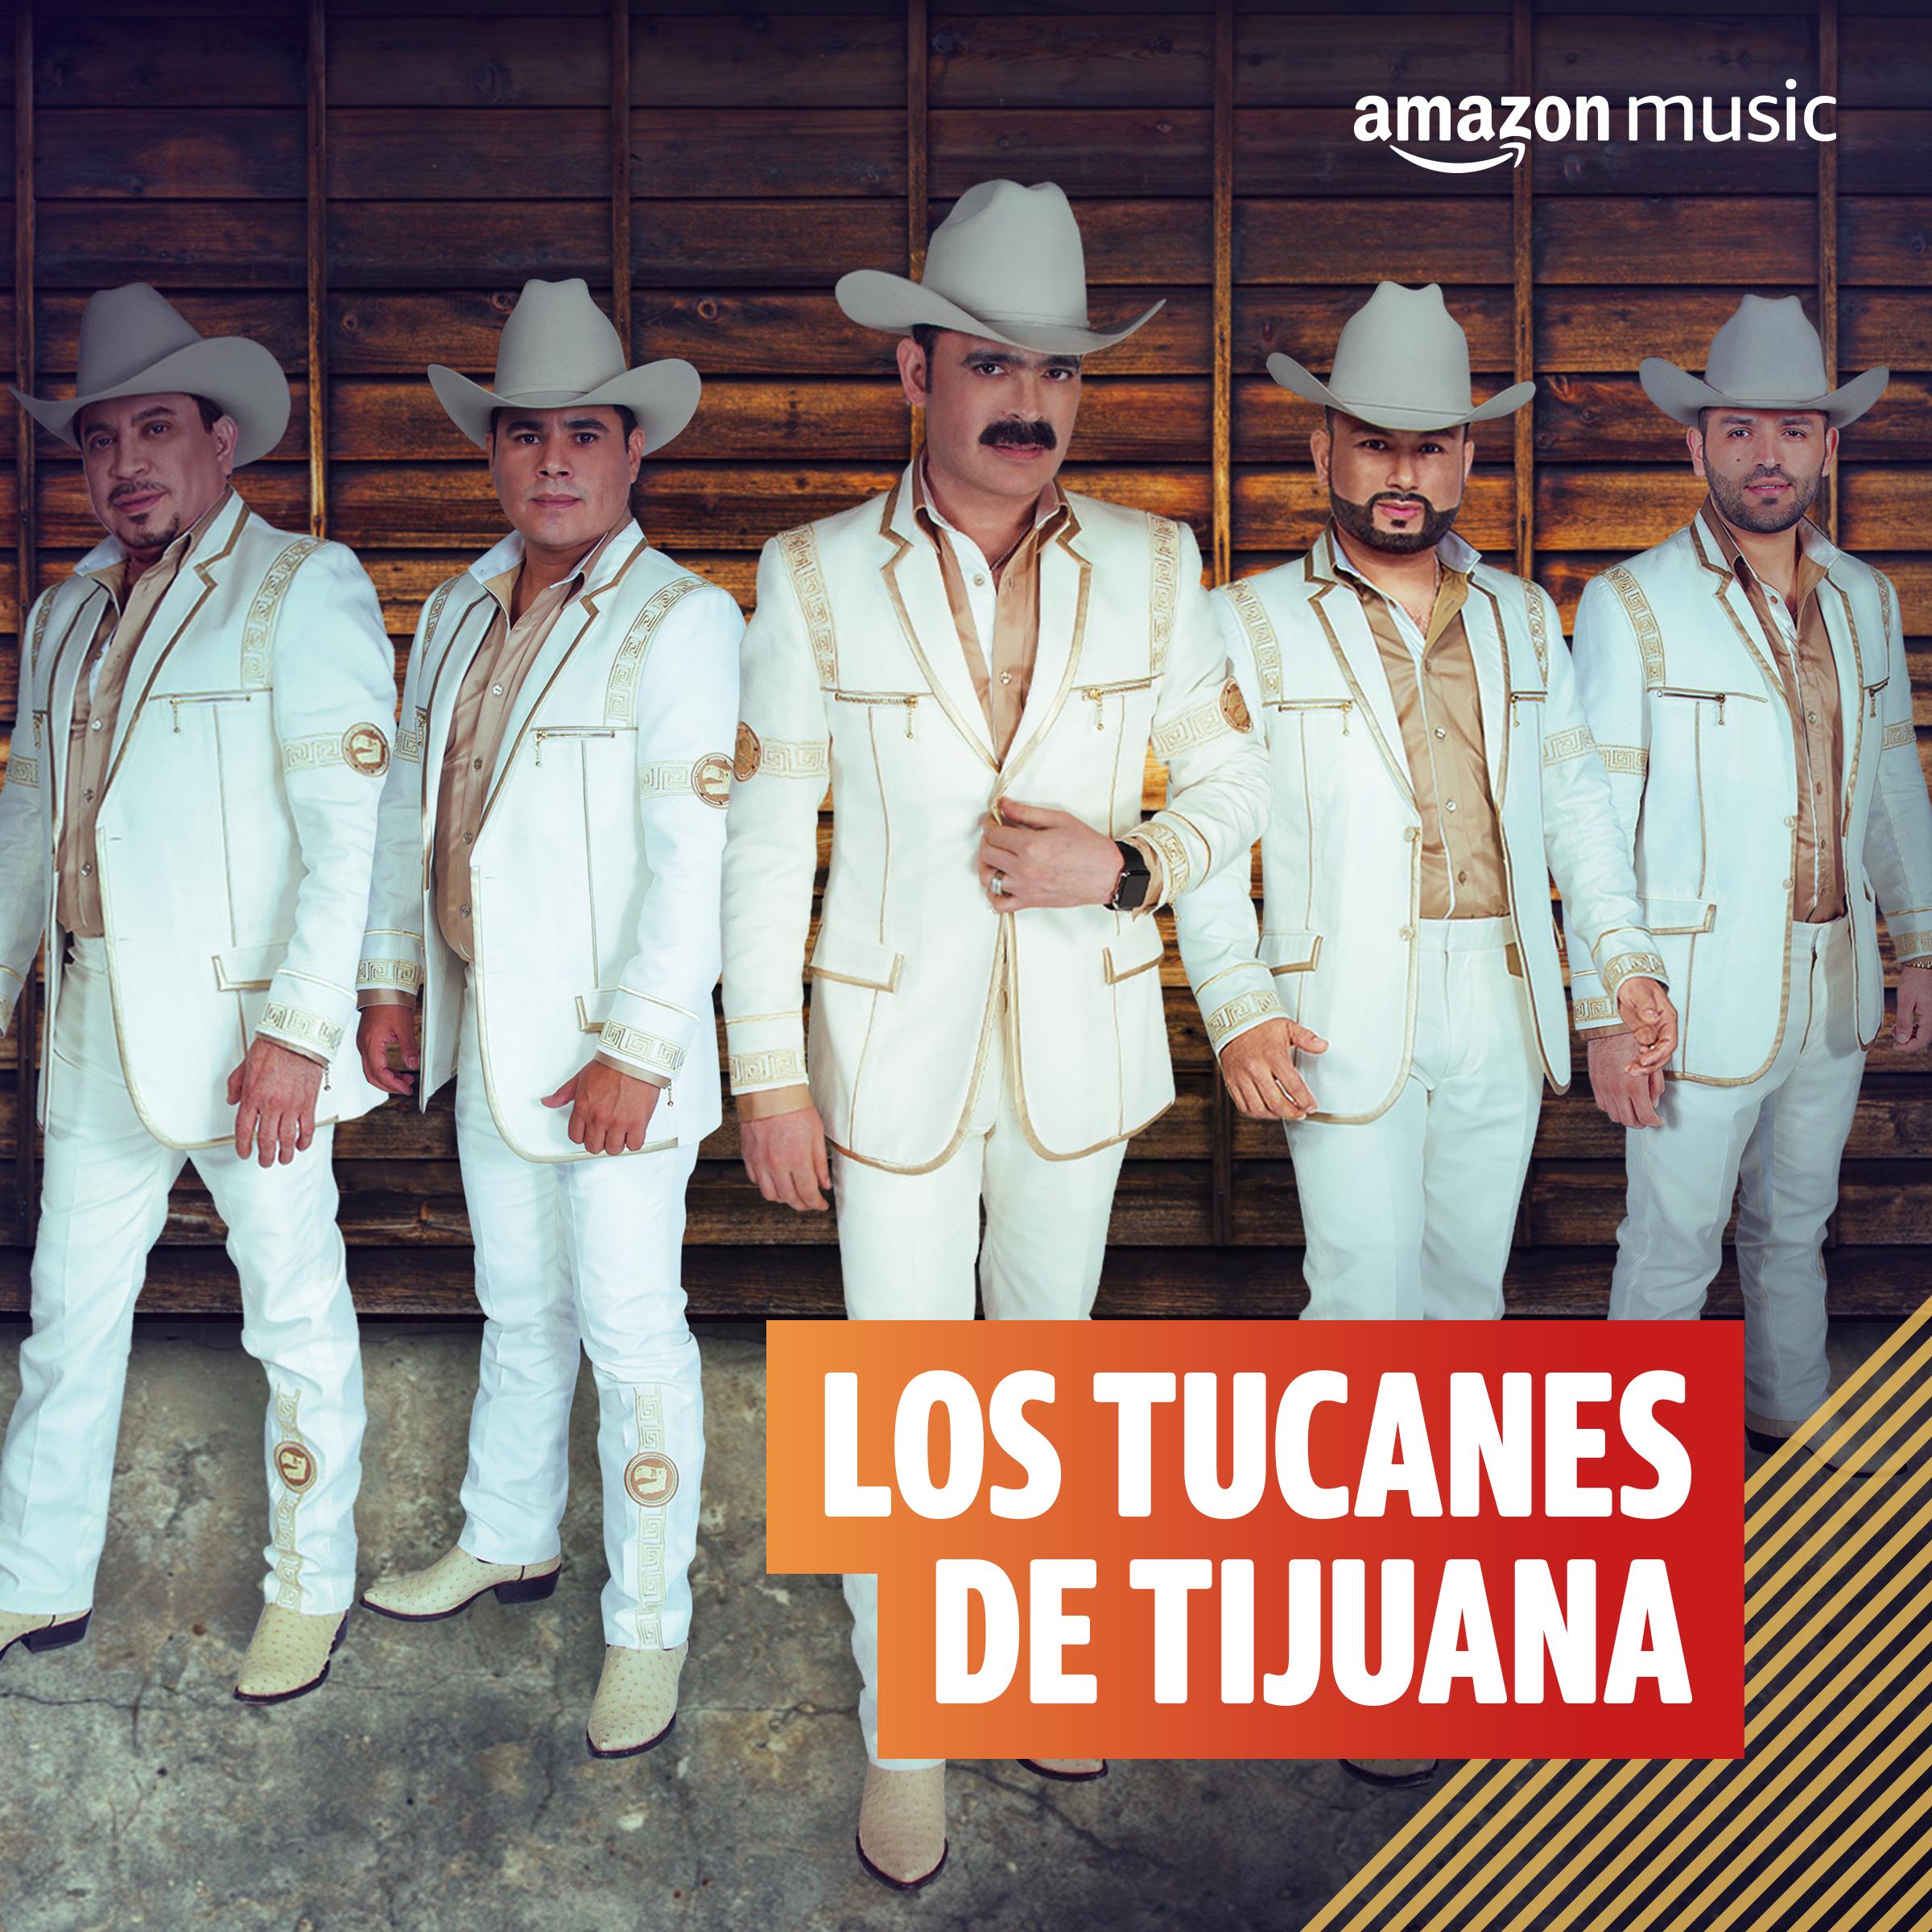 Amazon Music - Explorar estações